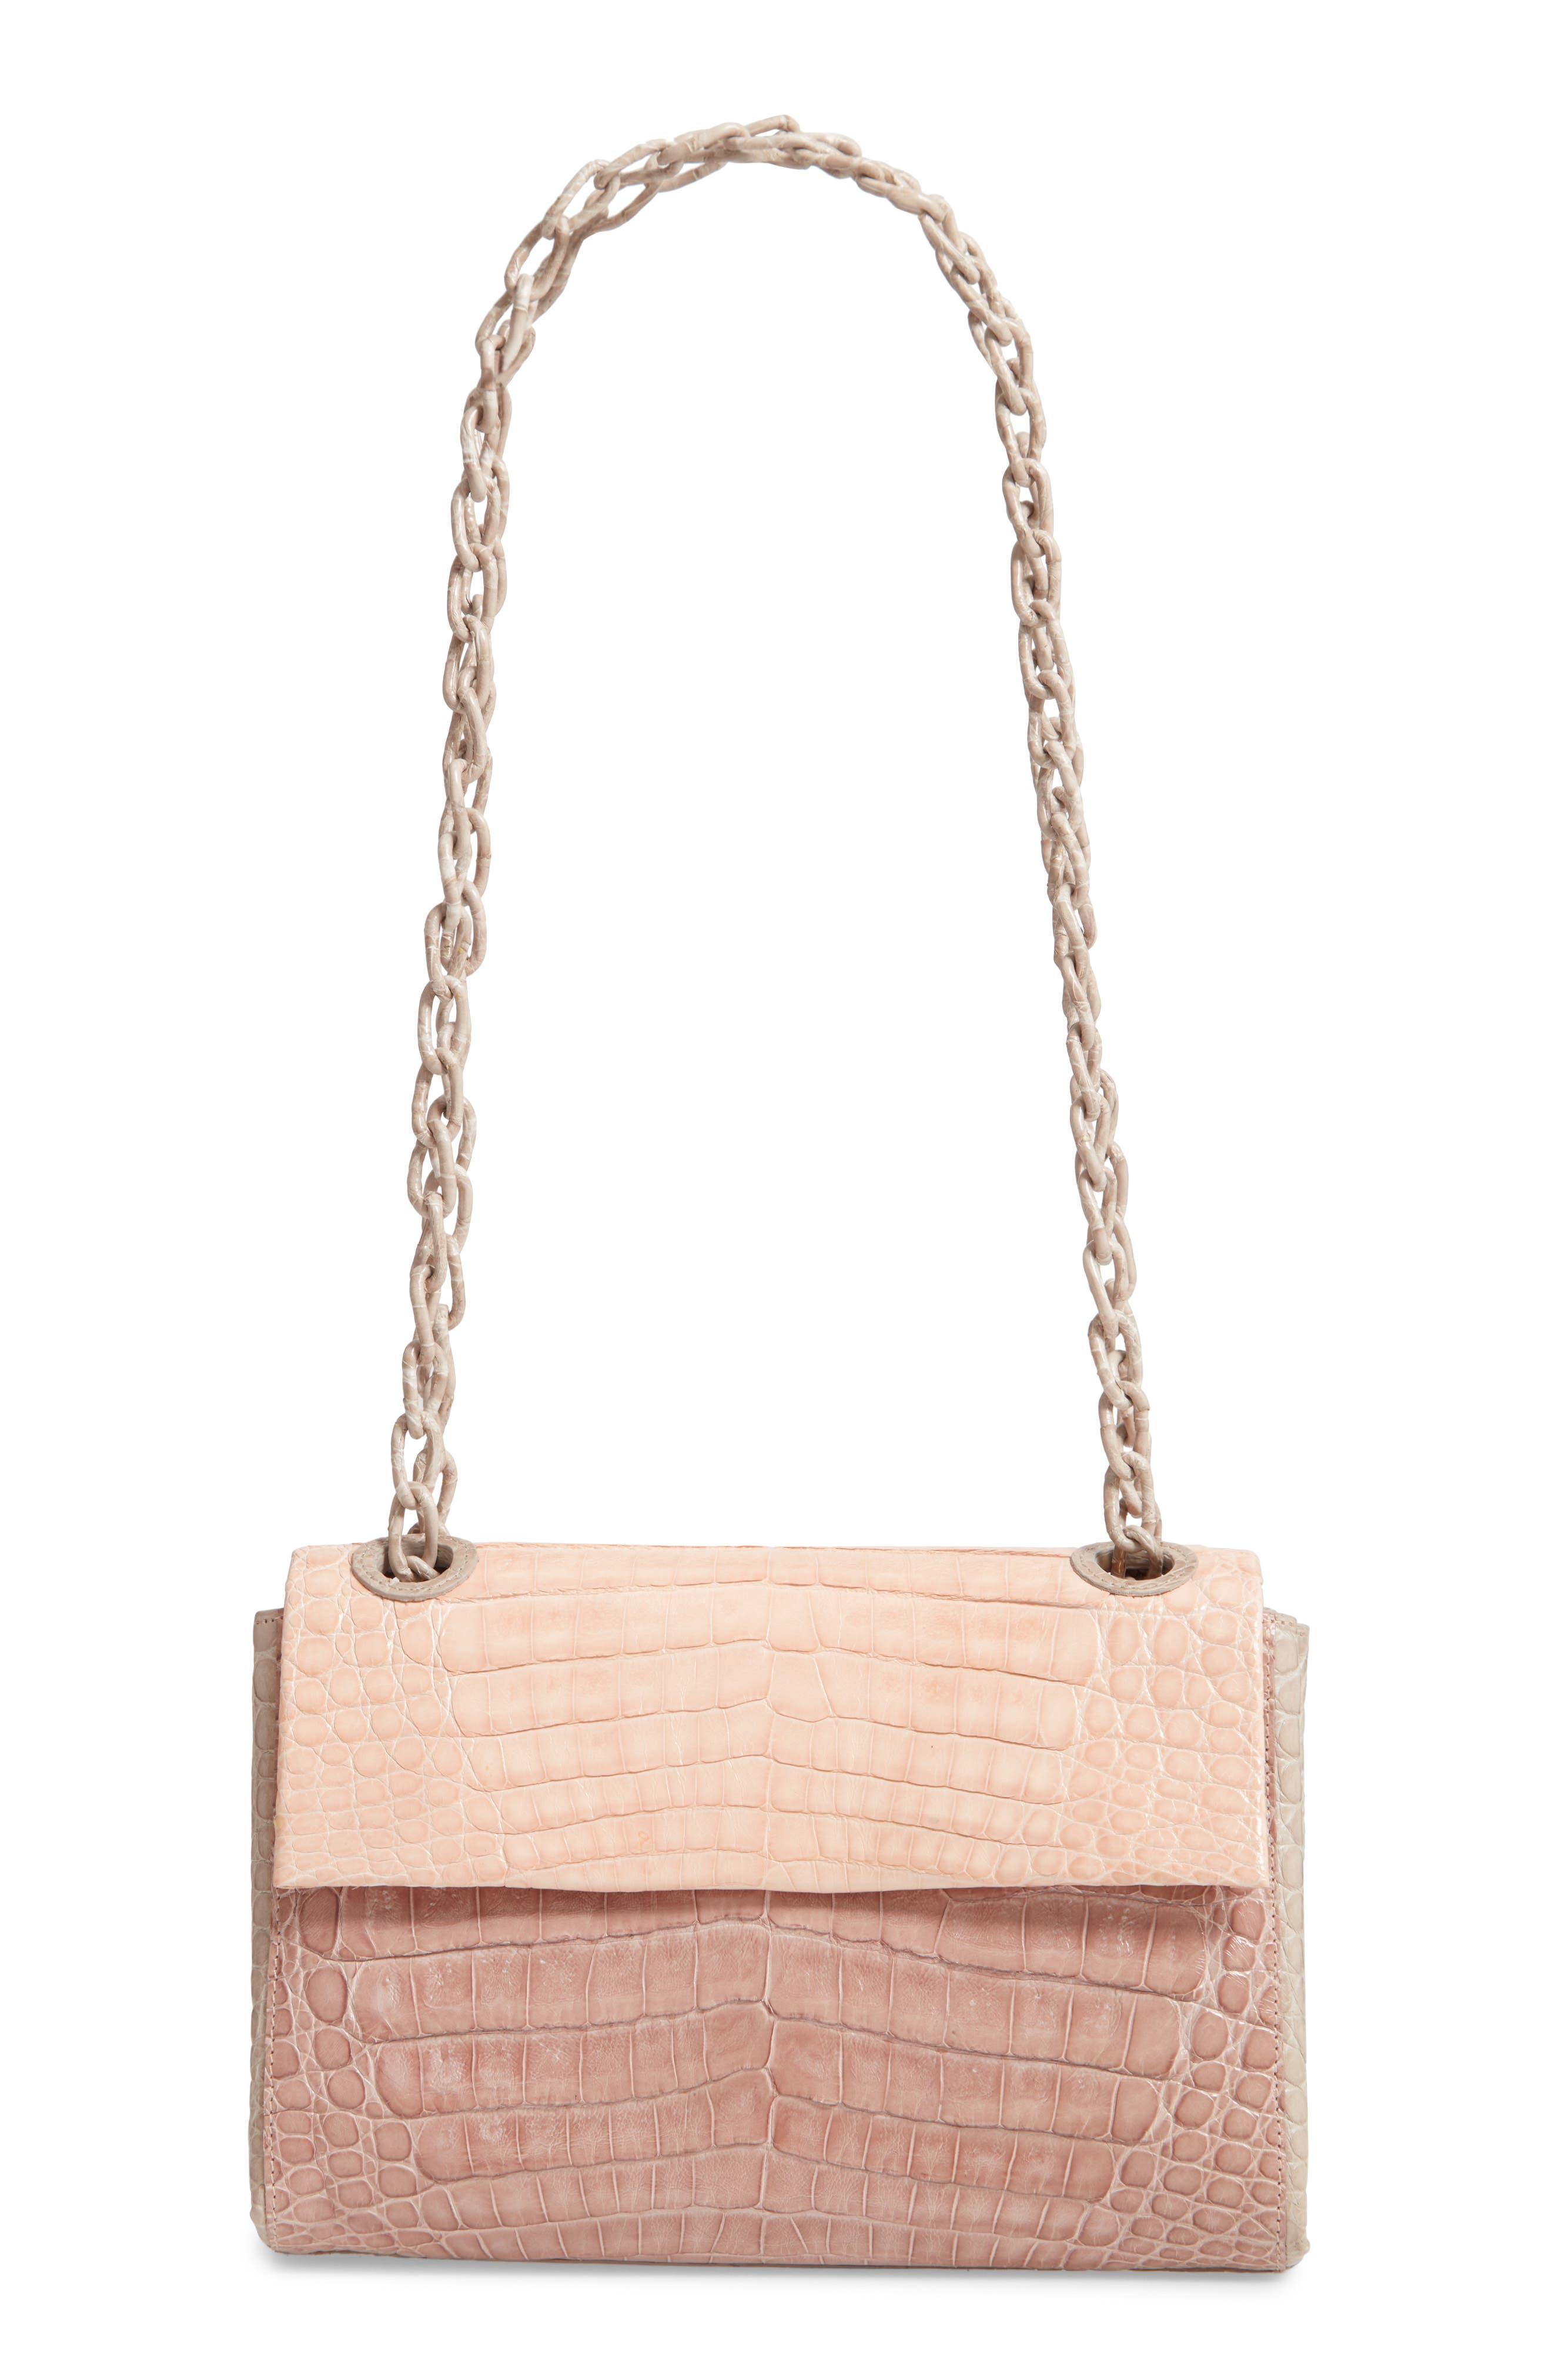 Small Madison Genuine Crocodile Shoulder Bag,                             Main thumbnail 1, color,                             NUDE/ TAUPE/ BLUSH